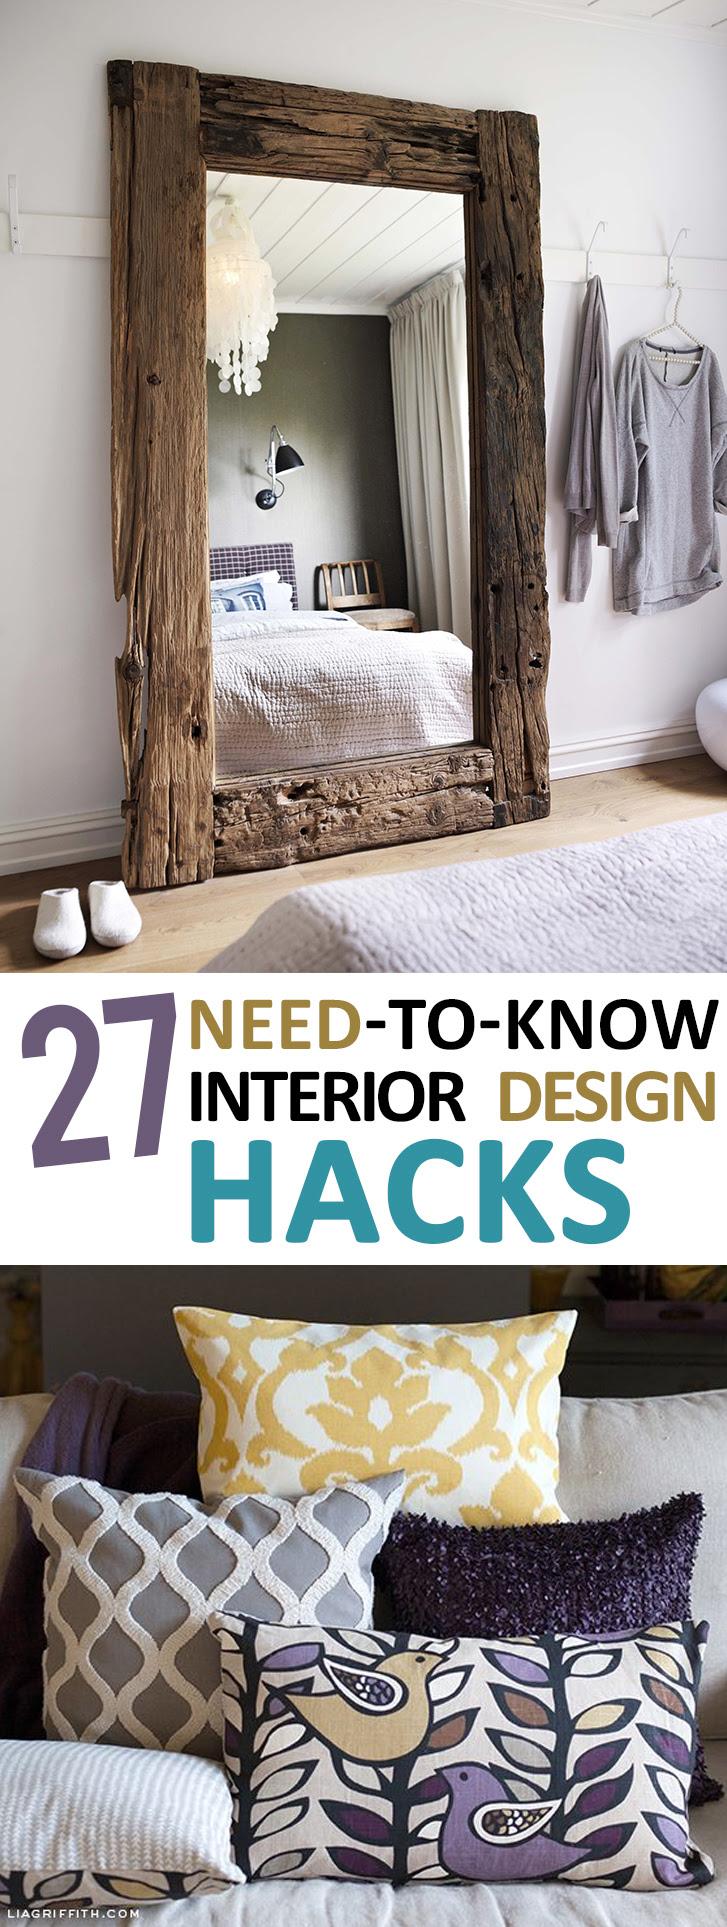 27 Needtoknow Interior Design Hacks Home Design